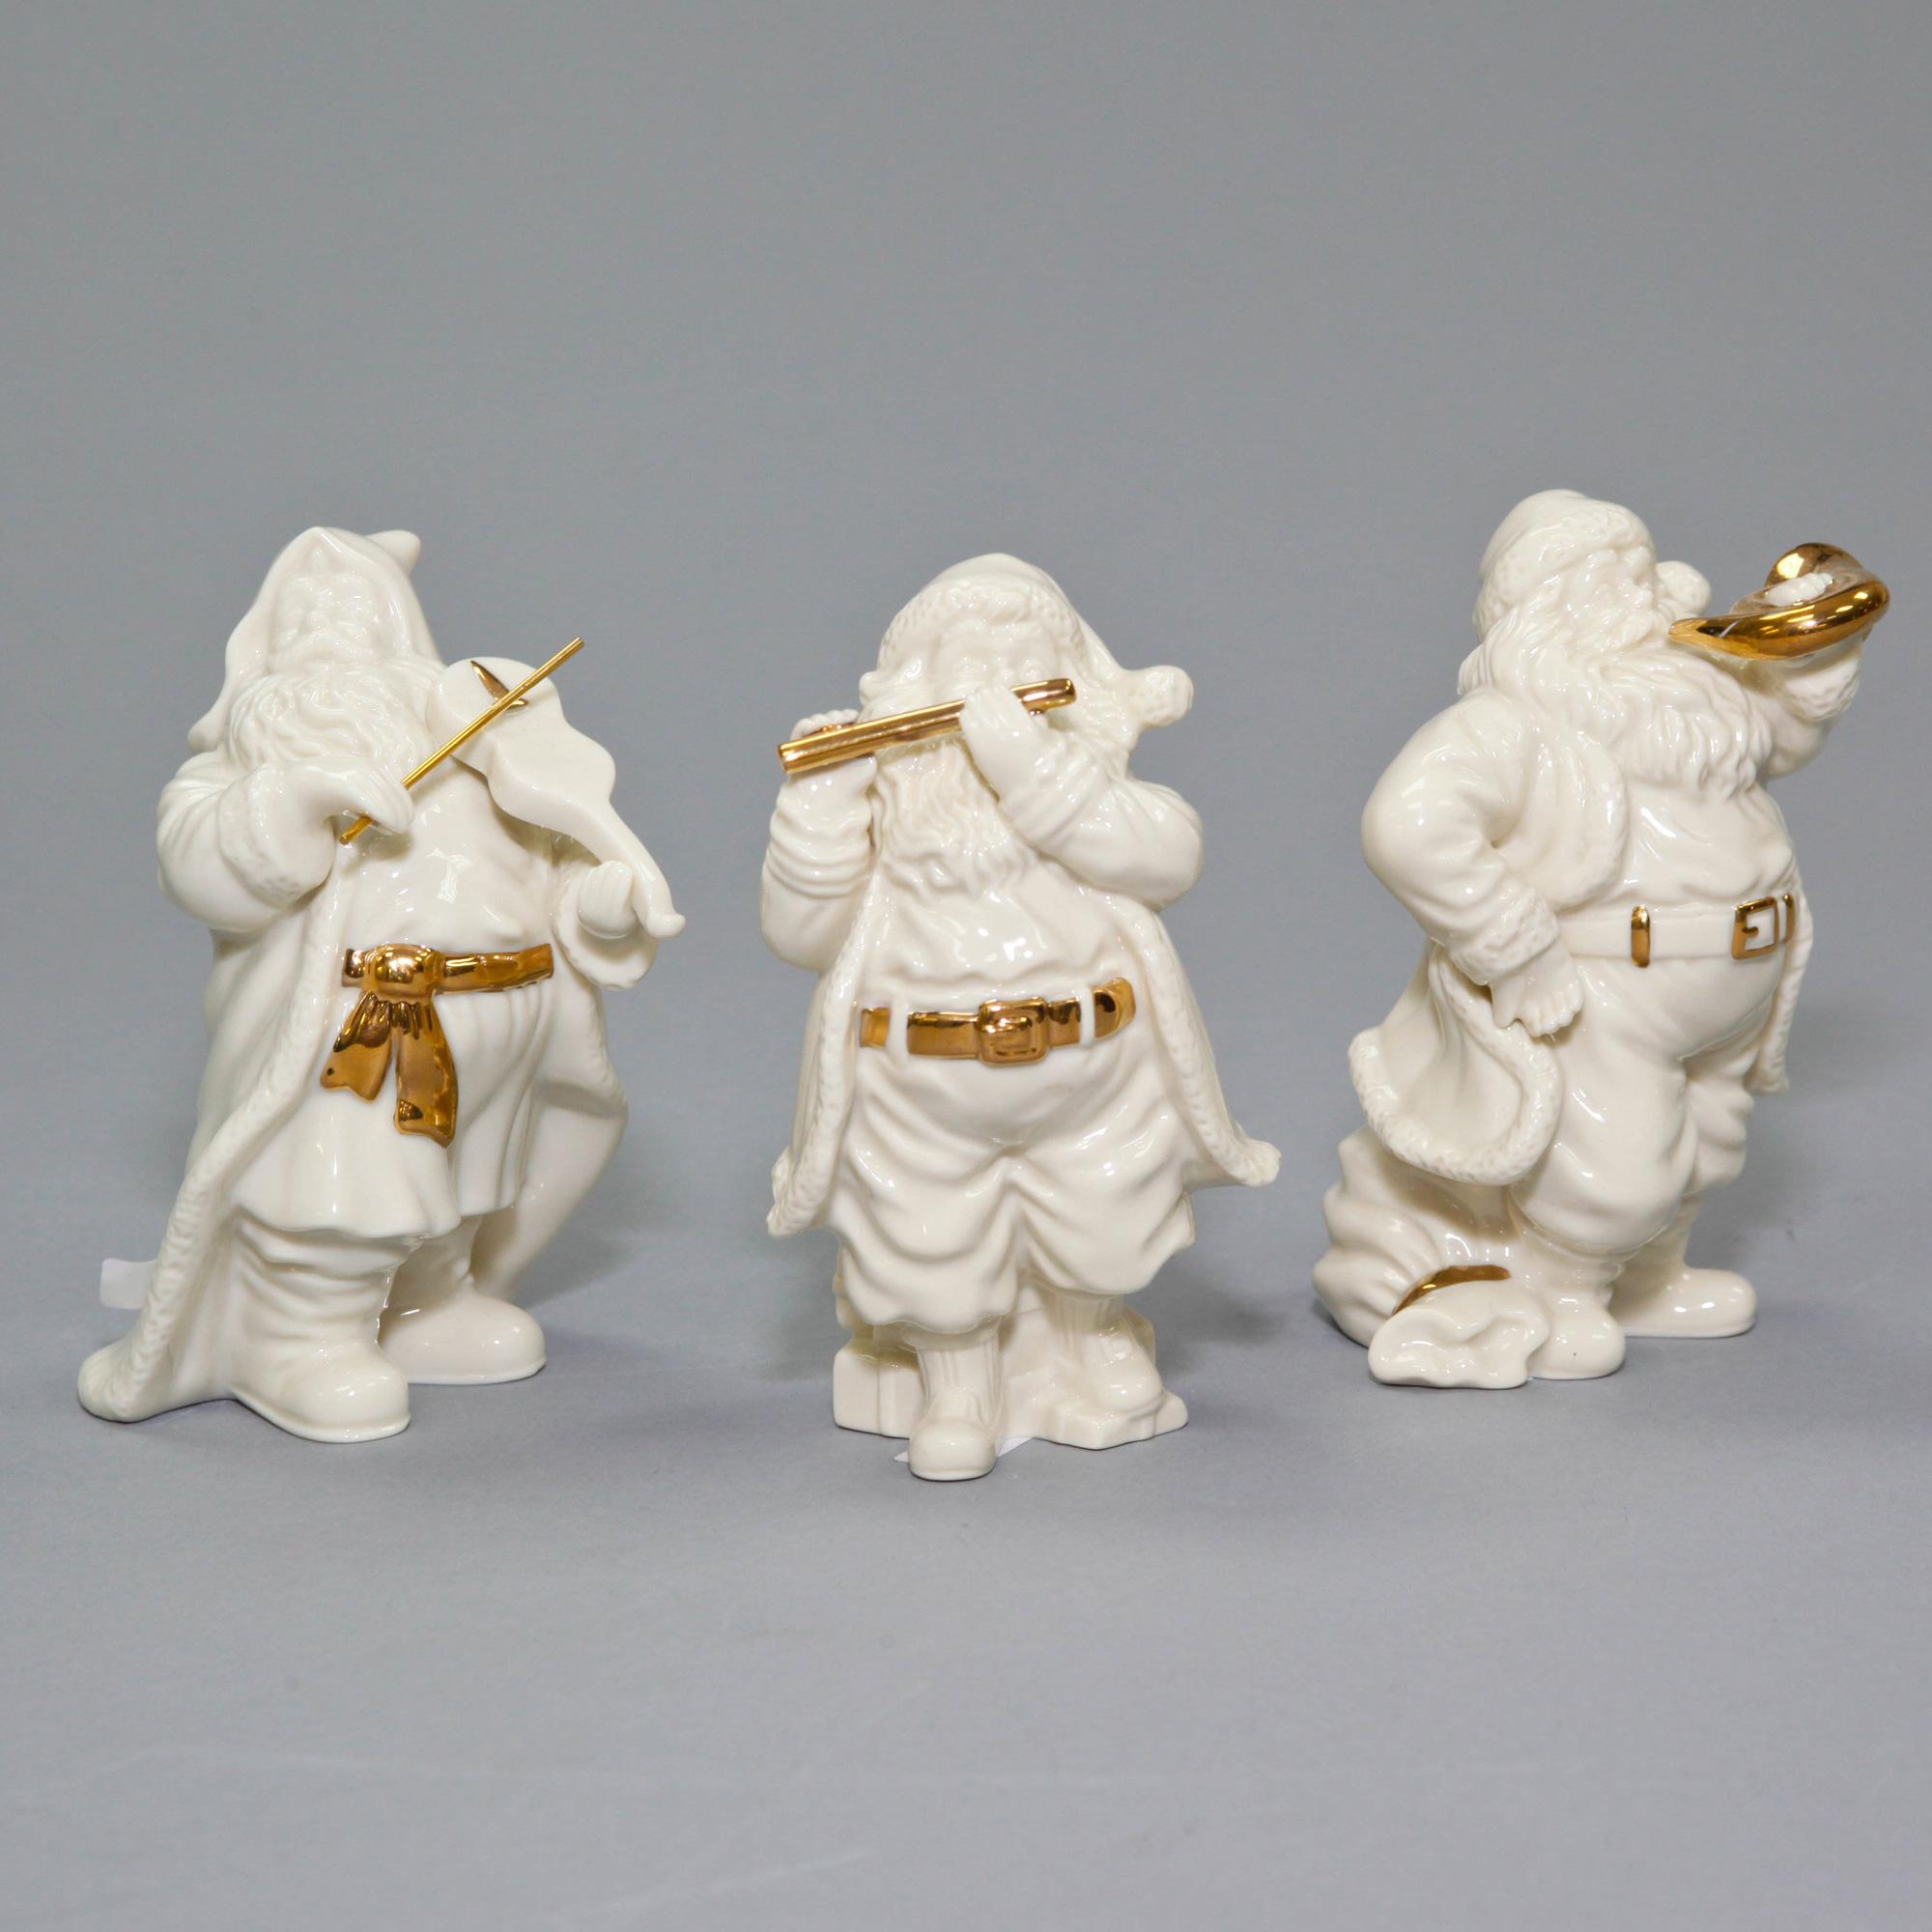 White Lenox Santa Claus playing Musical Instrument 3 piece set